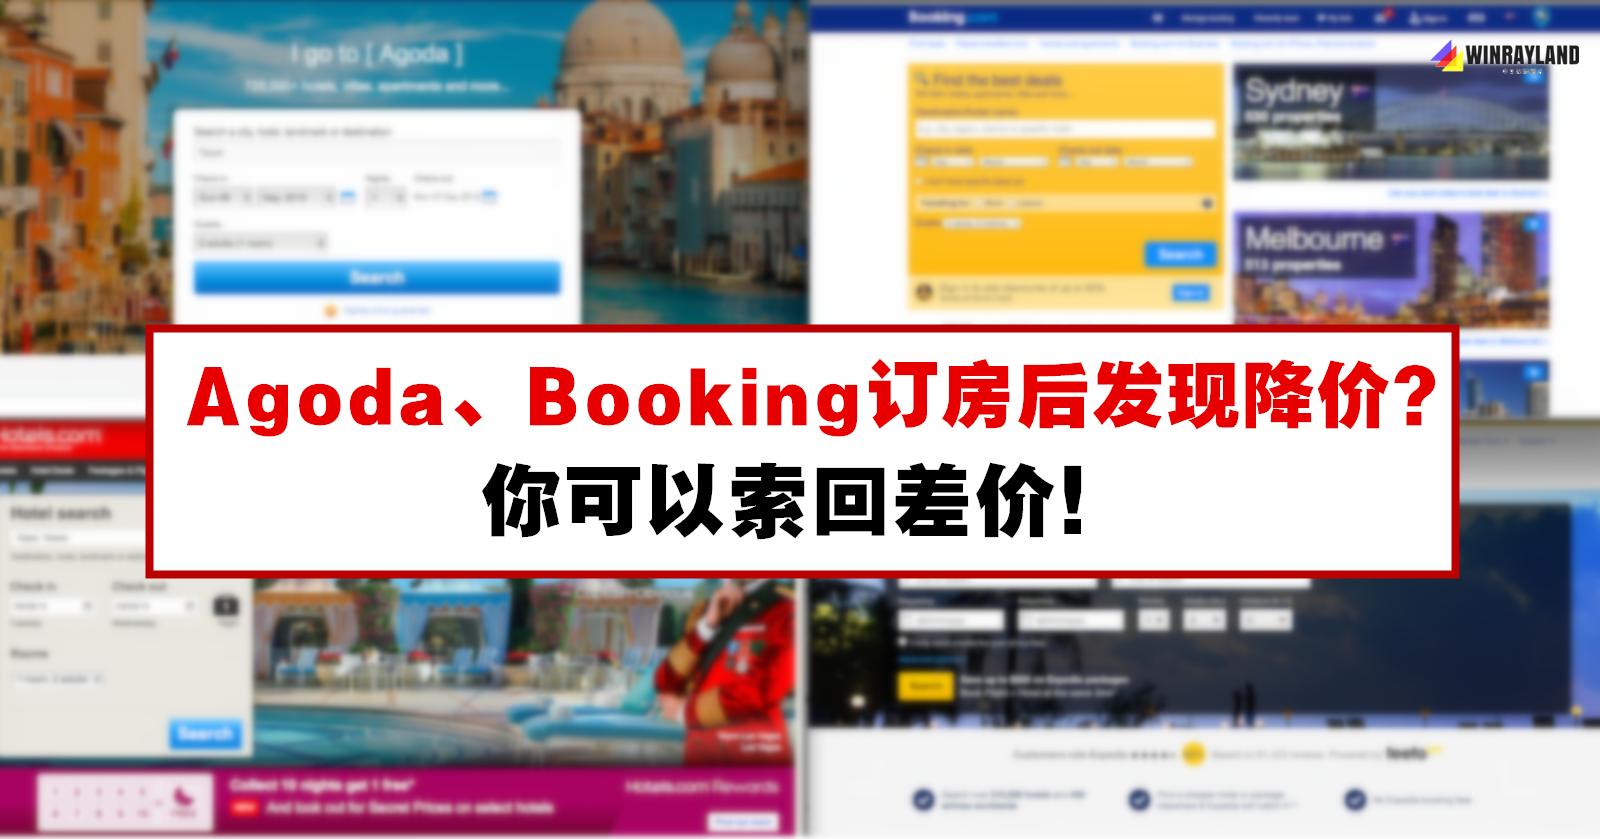 Agoda和Booking索回酒店差价的方法